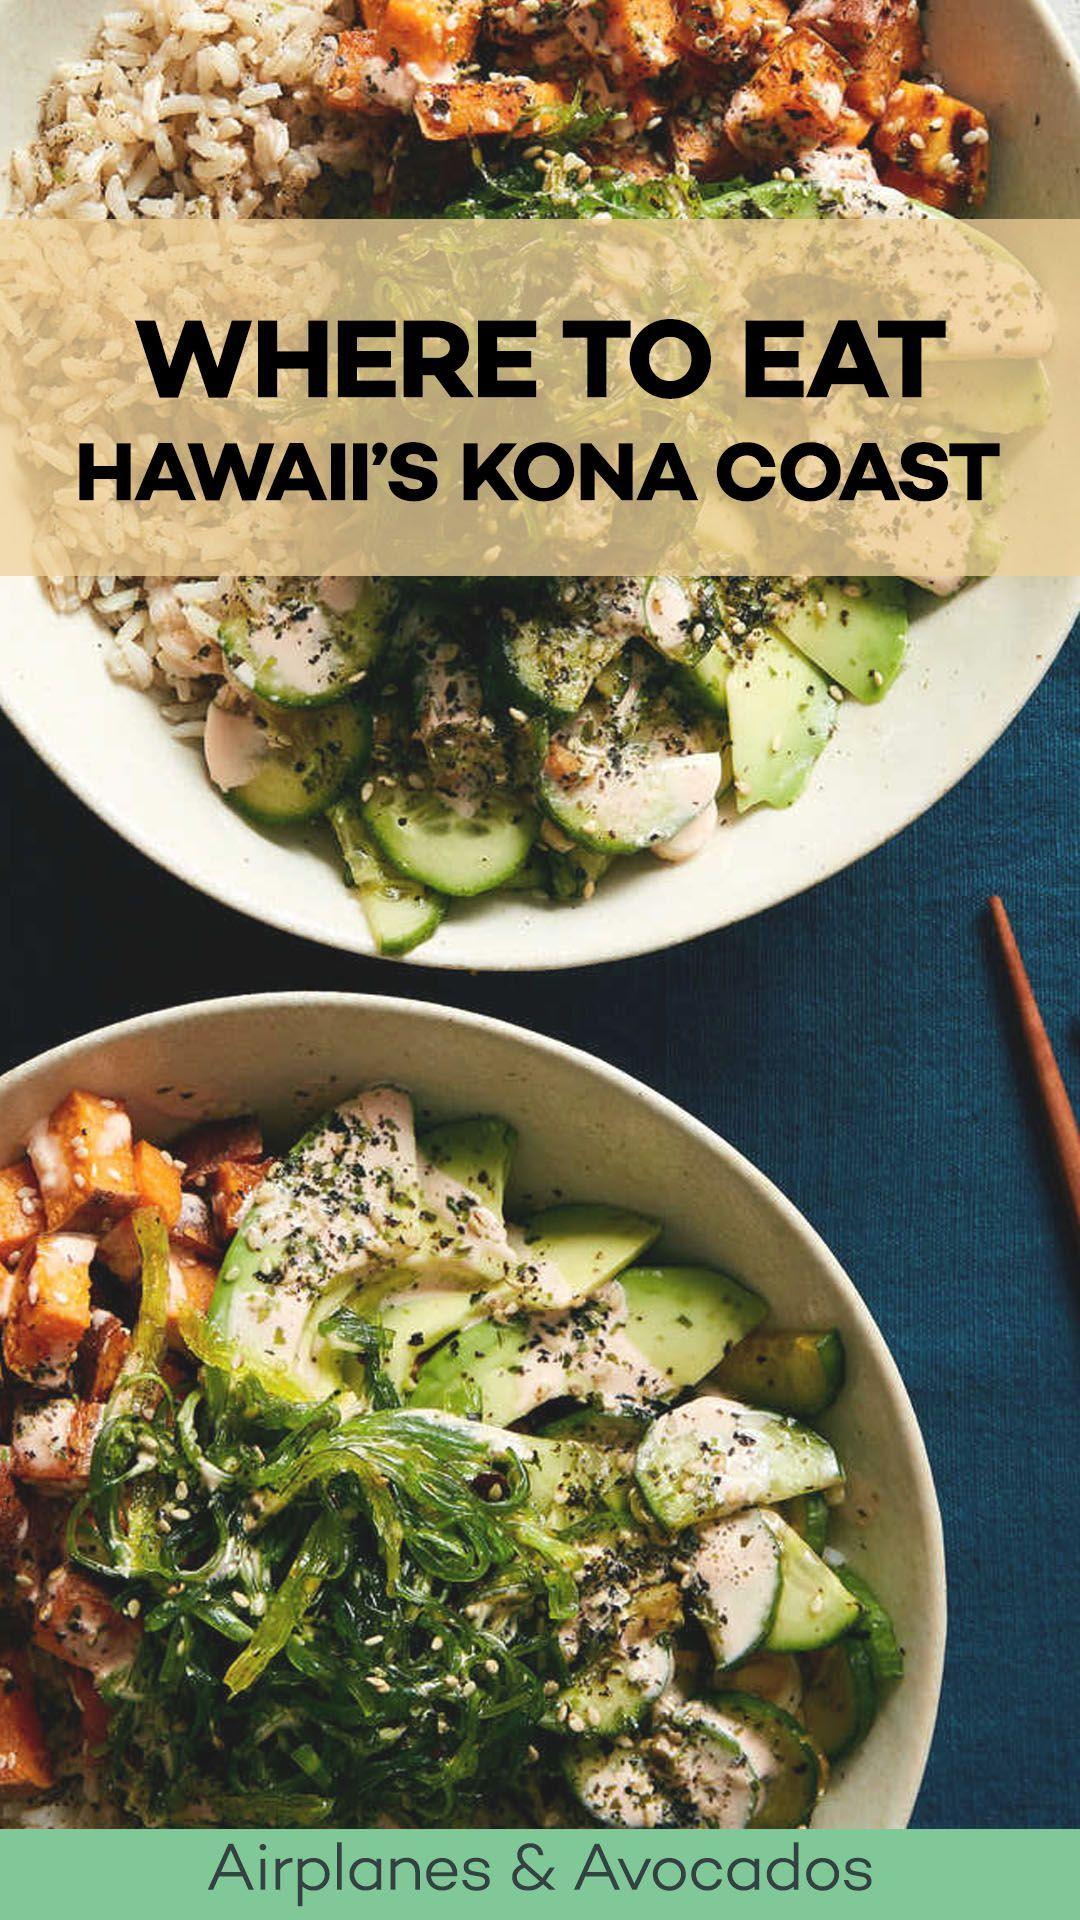 Where to Eat on the Big Island's Kona Coast | Airplanes & Avocados Members of our family enjoyed Kailua Kona area ....